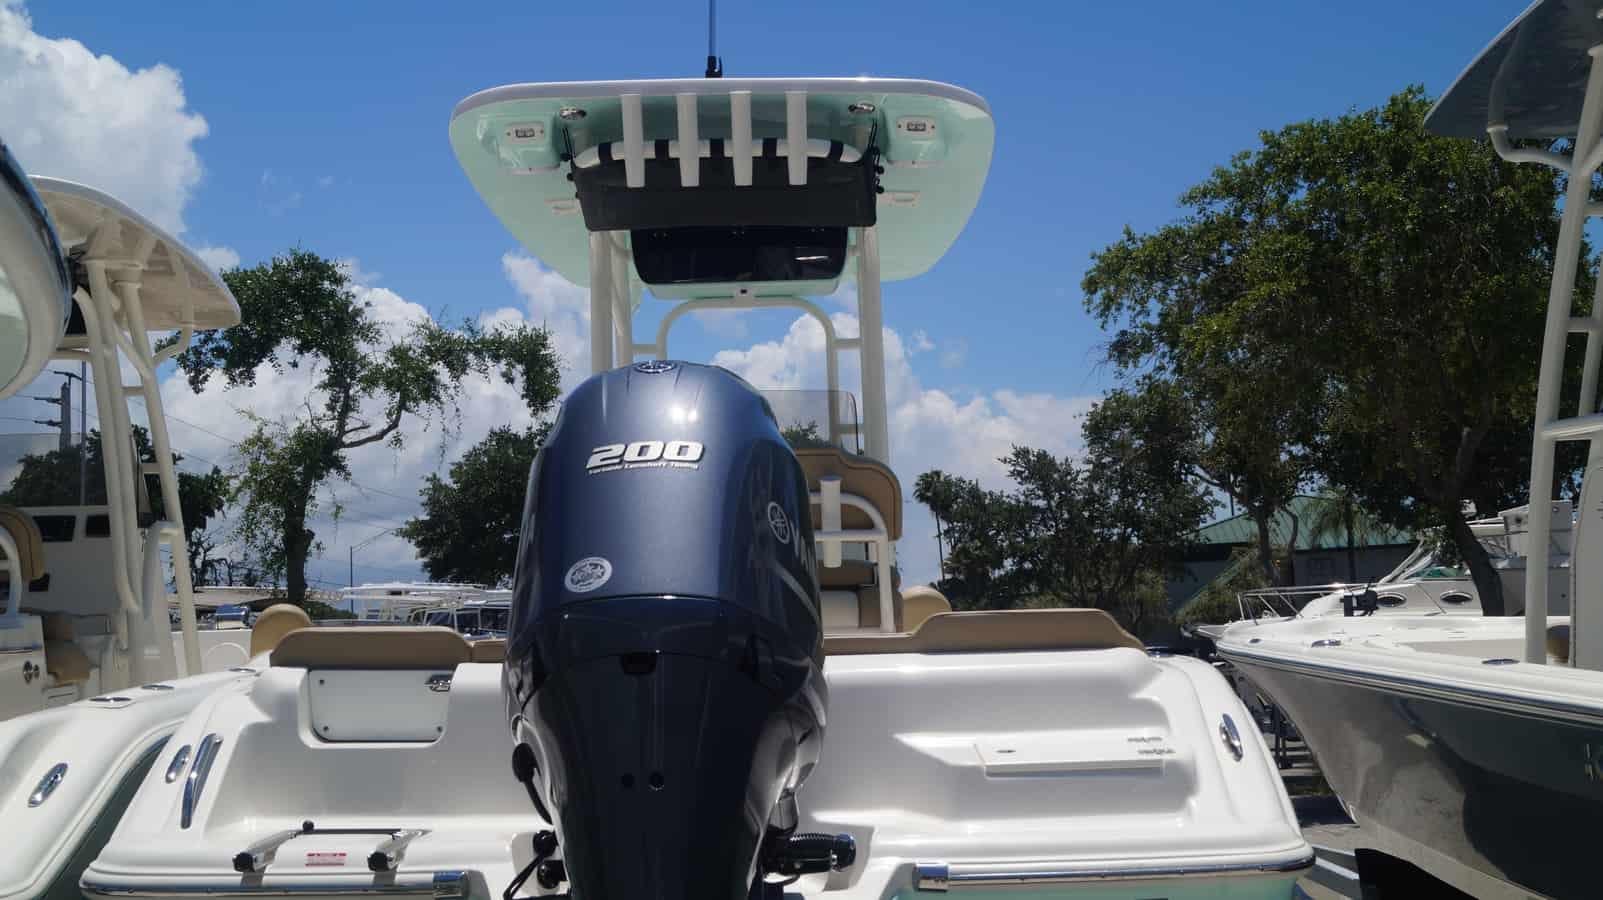 Peachy New 2019 Key West Boats Inc 219Fs Sarasota Fl Andrewgaddart Wooden Chair Designs For Living Room Andrewgaddartcom